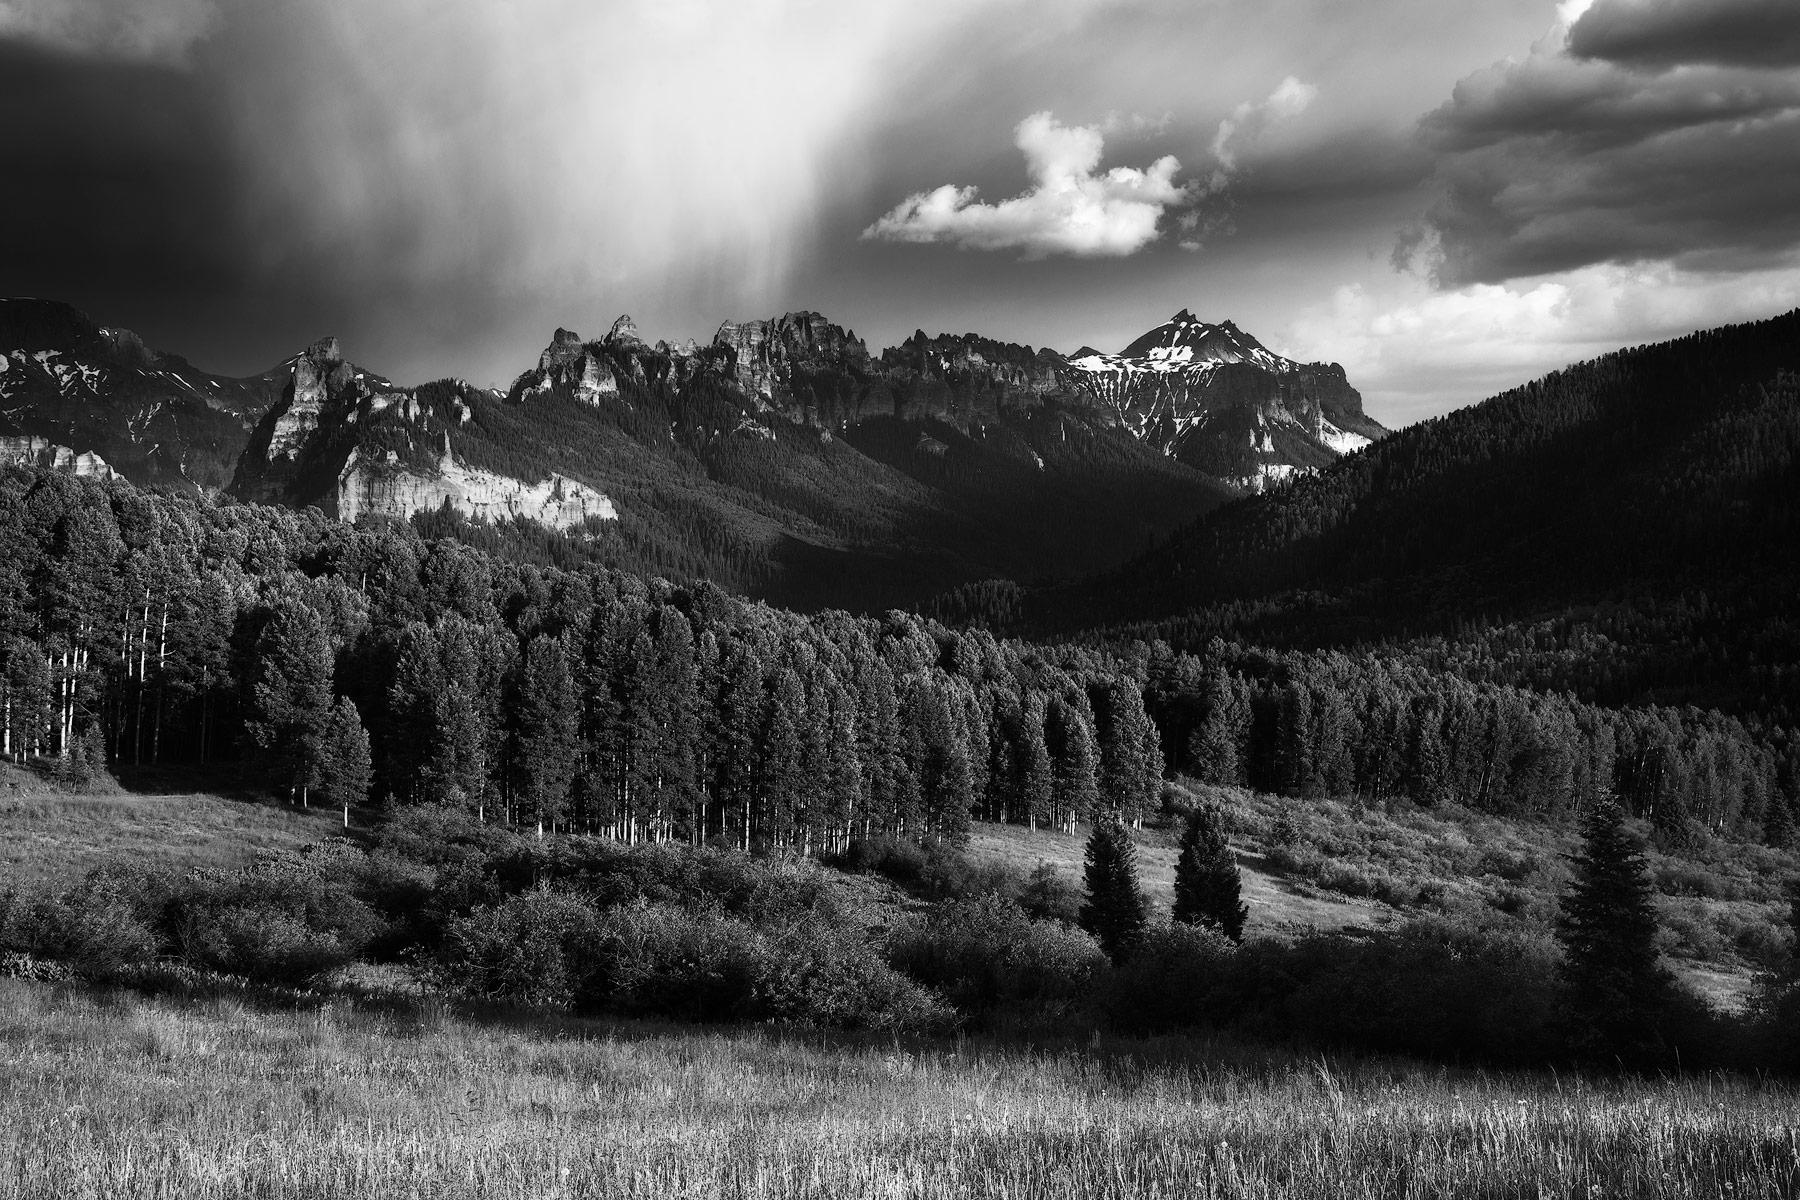 Sarah-Marino-San-Juan-Mountains-Colorado-Black-White-1200px.jpg